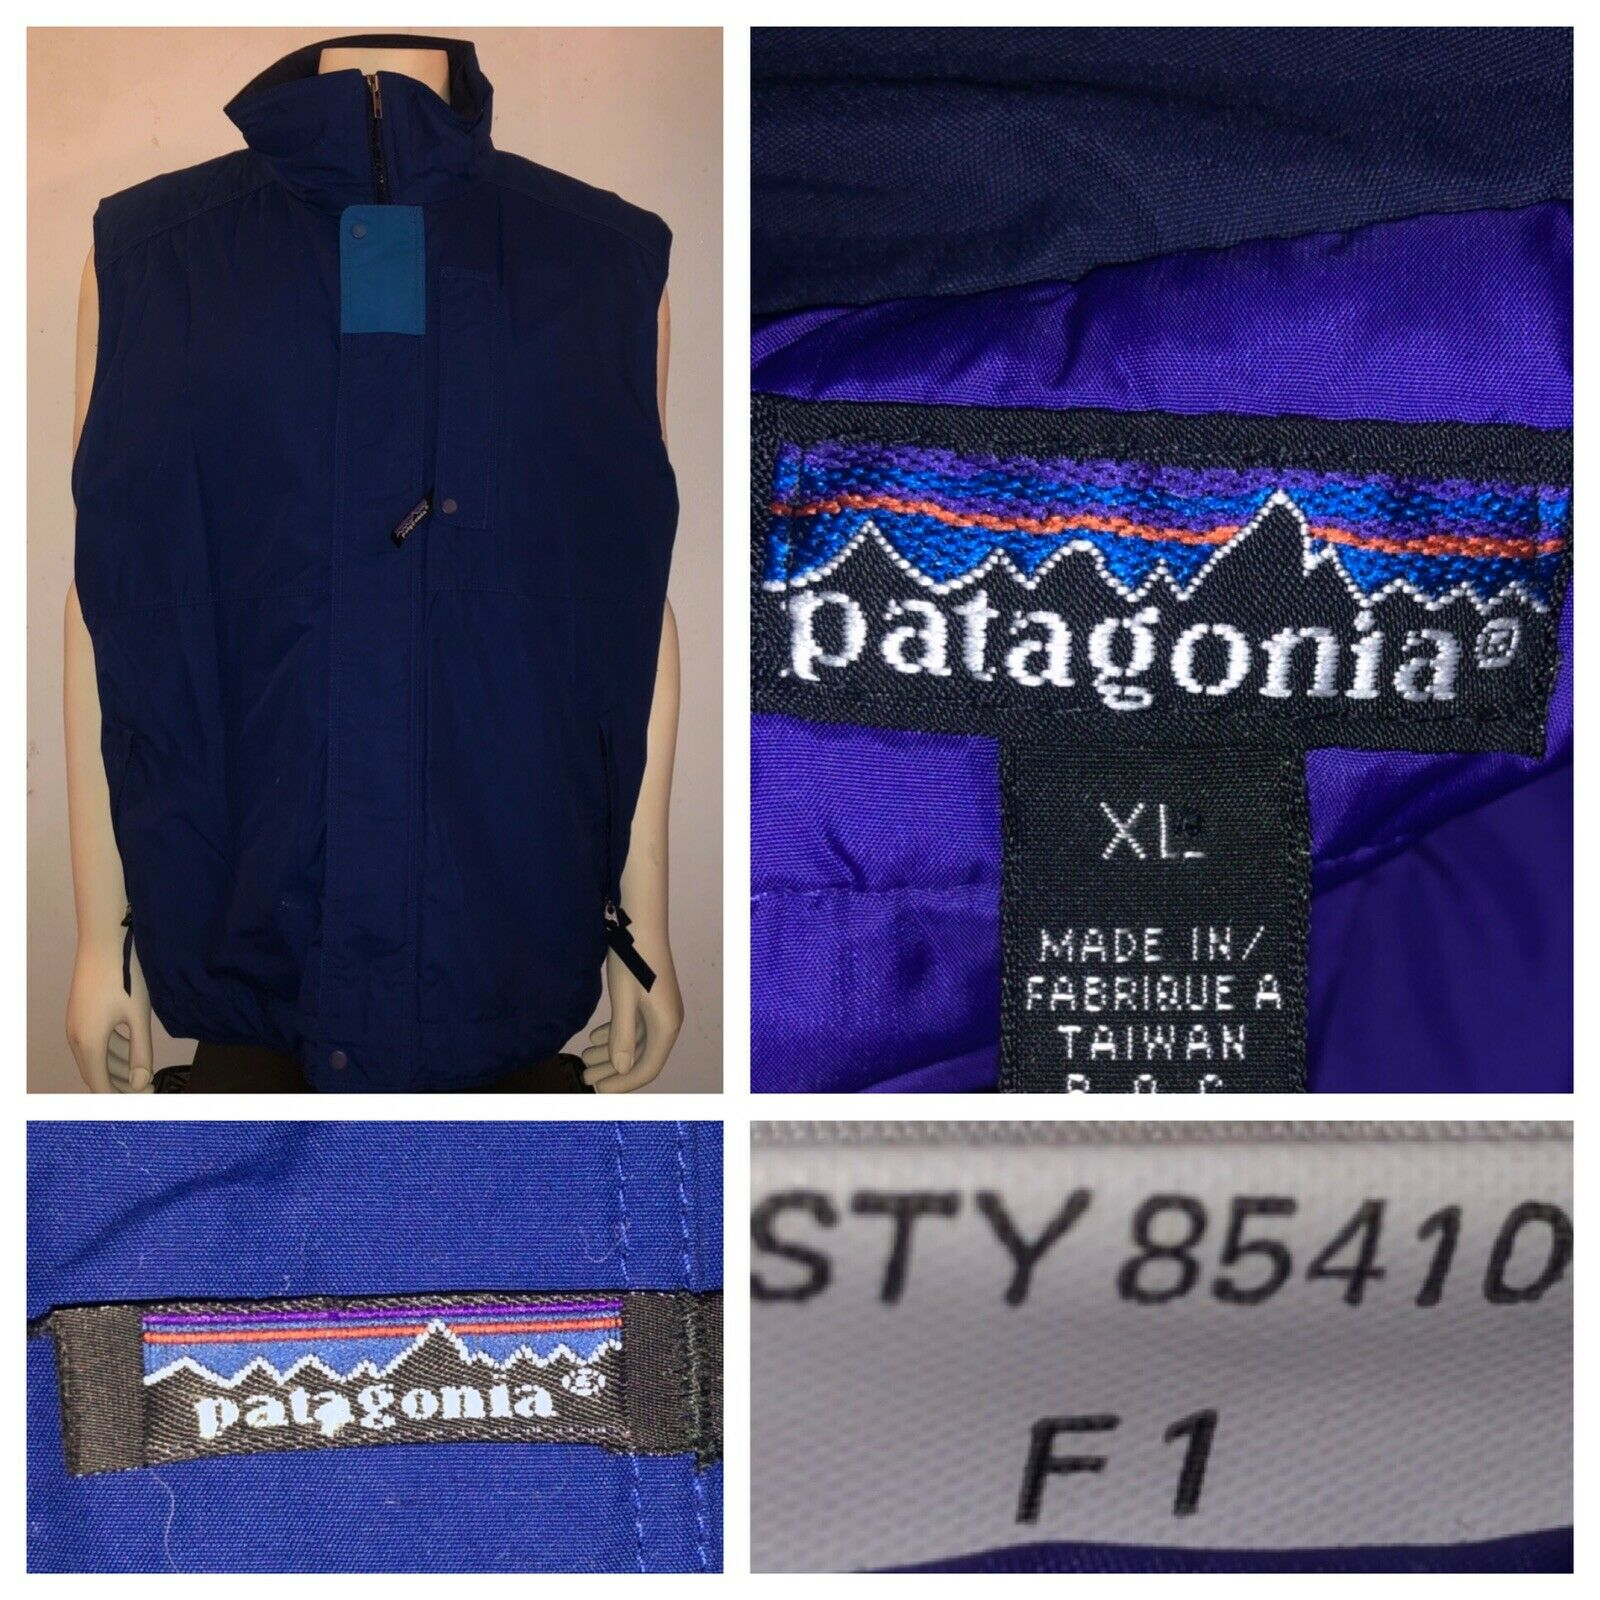 Vtg Patagonia Men's Full Zip bluee Nylon Insulated Ski Snowboard Outdoors Vest XL